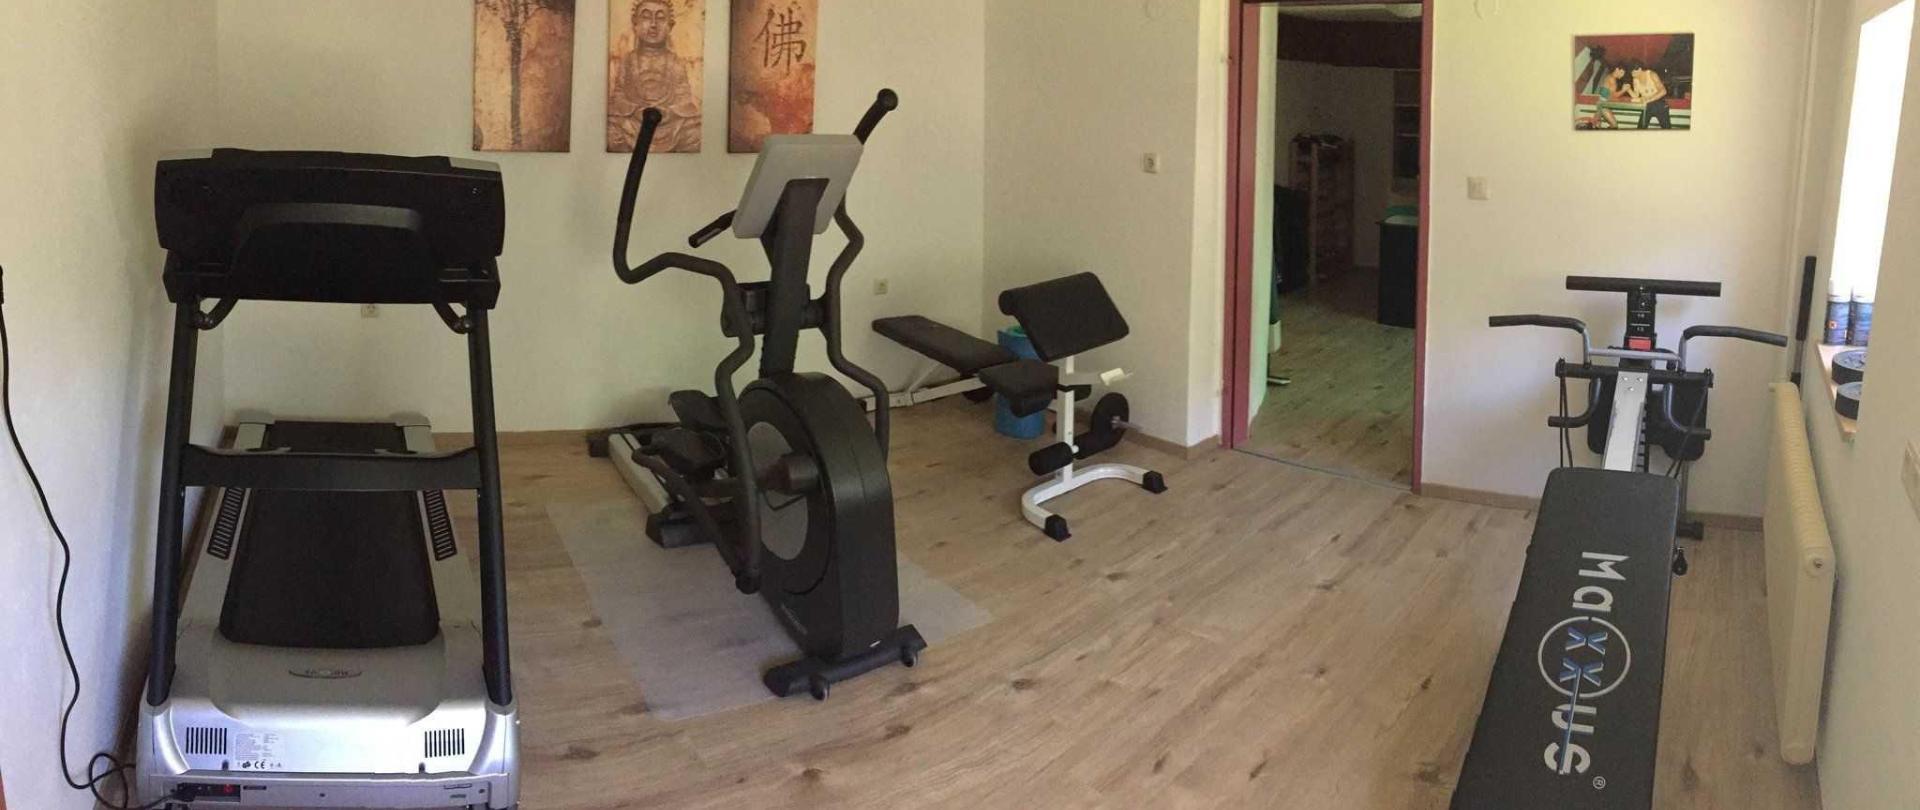 Fitnessraum.jpg